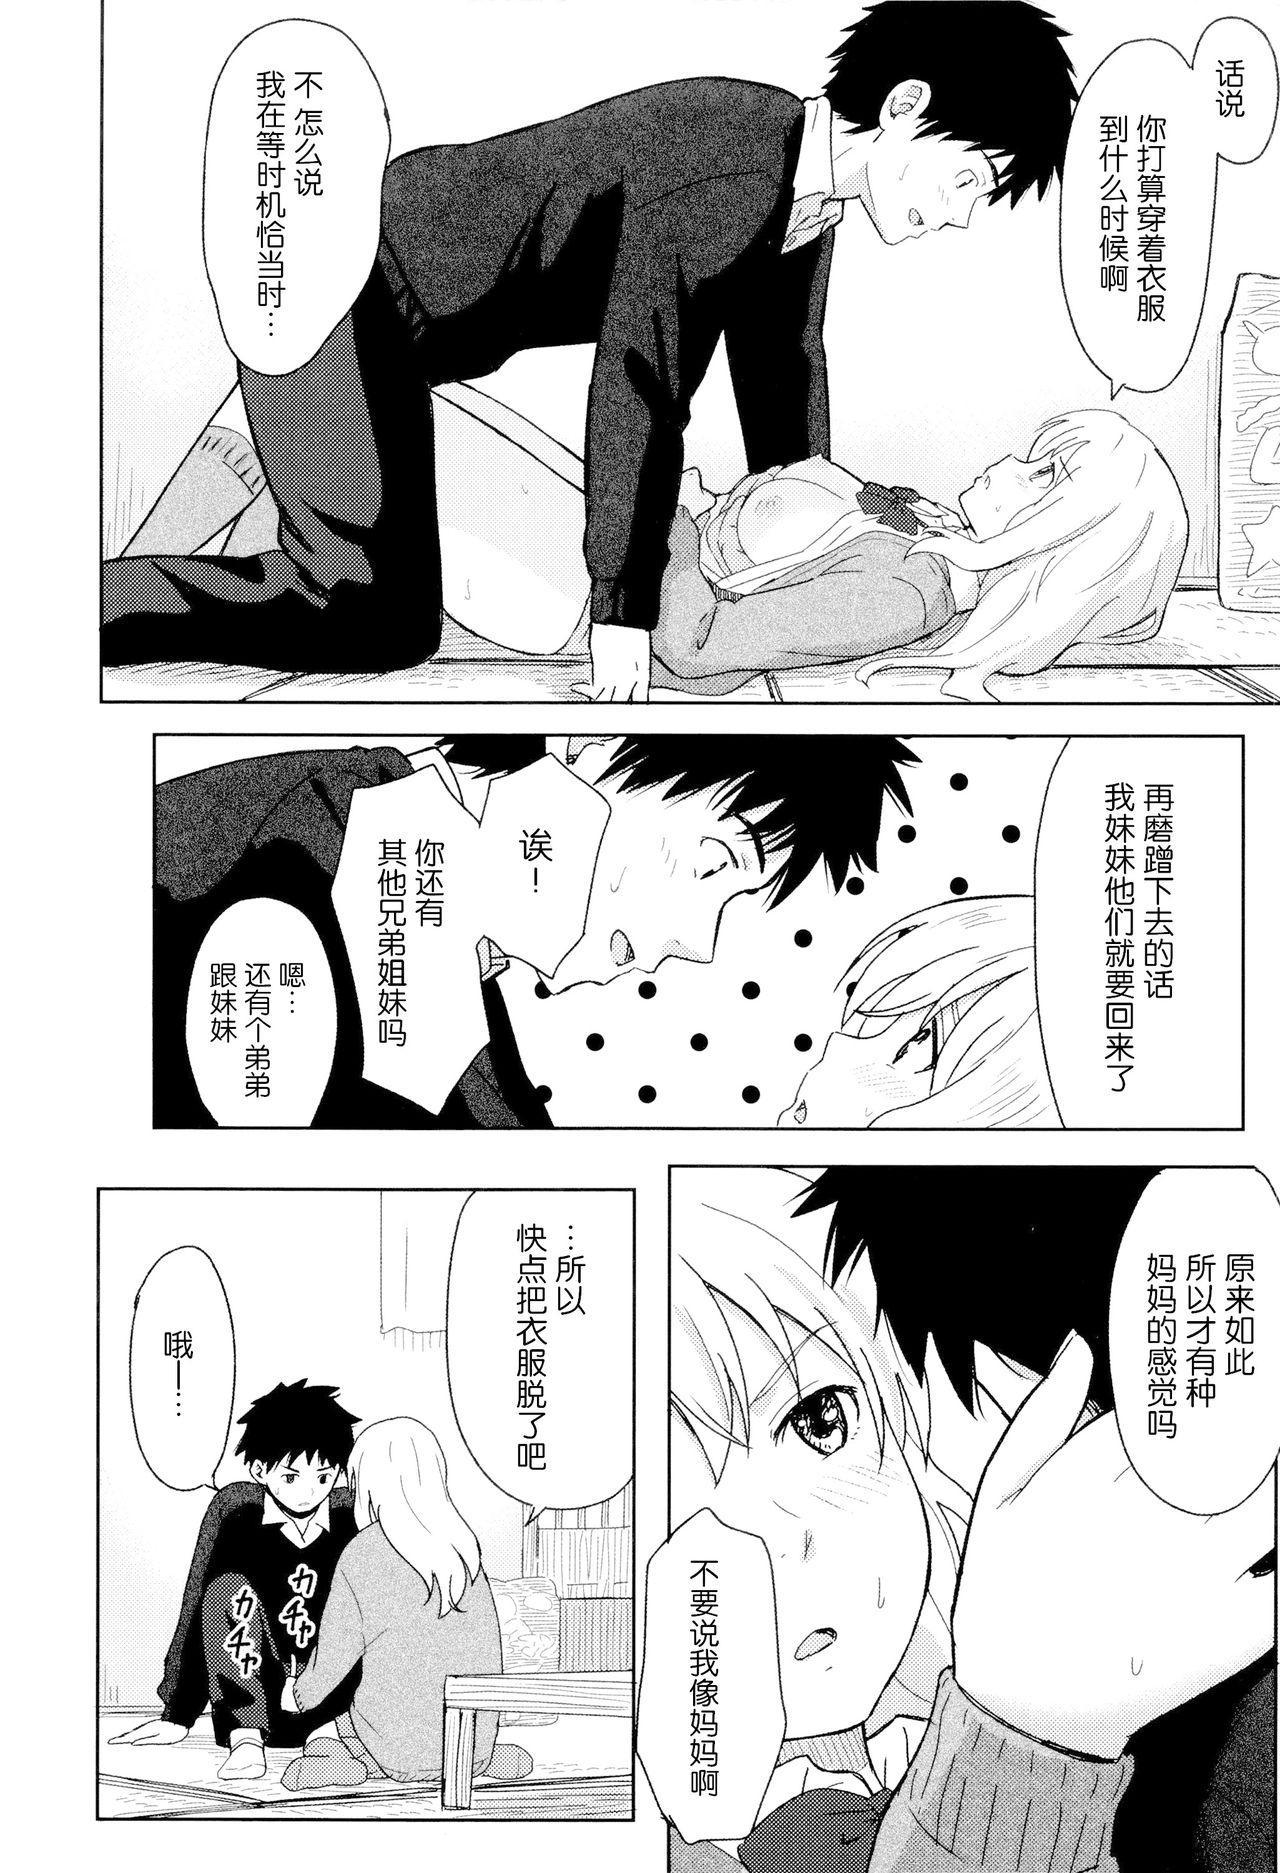 Tokubetsu na Mainichi - Special daily 24